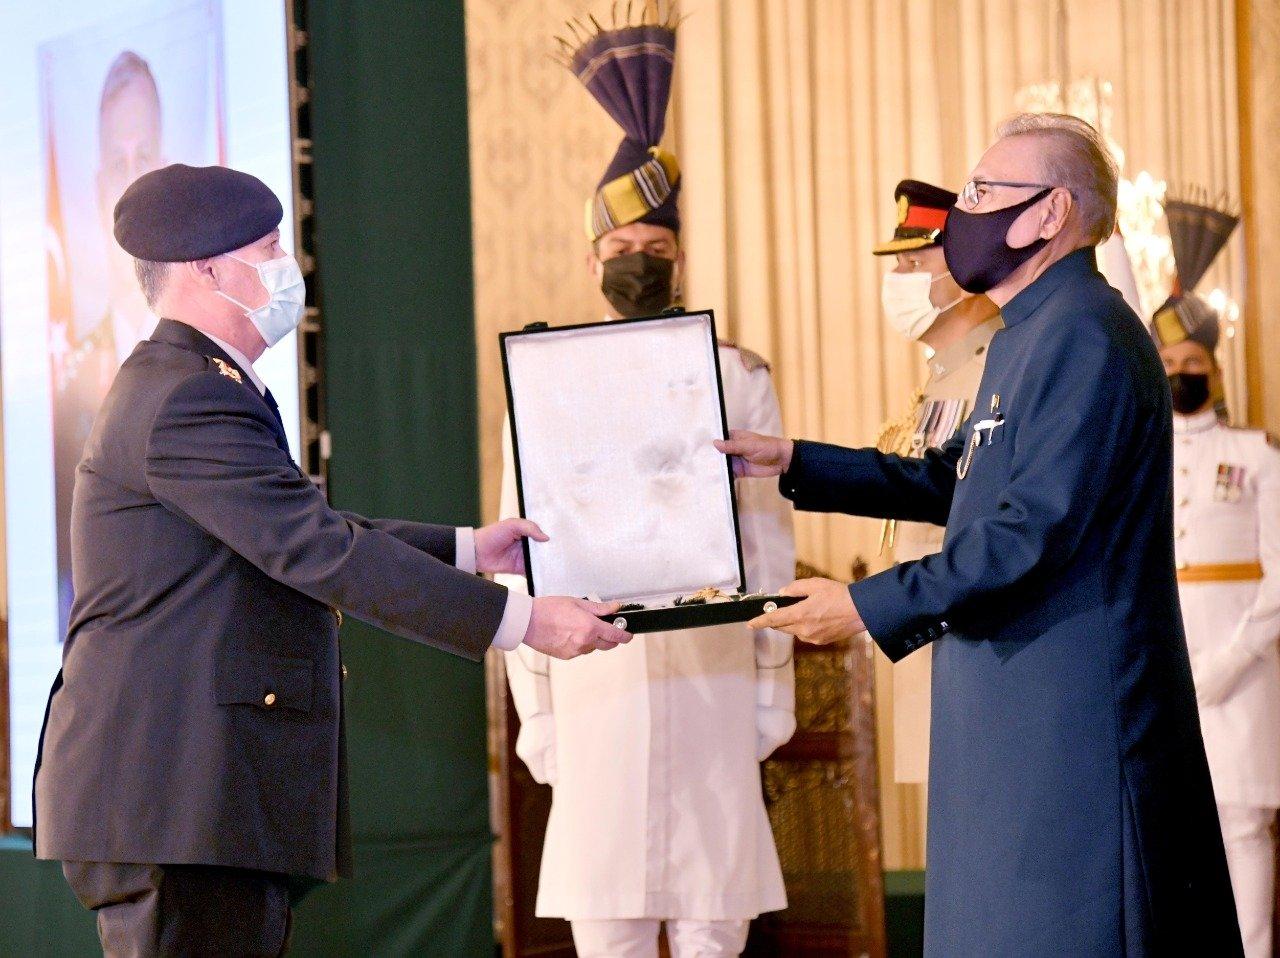 Pakistan's President Arif Alvi (R) presents an order to the Commander of the Turkish Land Forces, Gen. Ümit Dündar, Islamabad, Pakistan, July 5, 2021 (AA Photo)